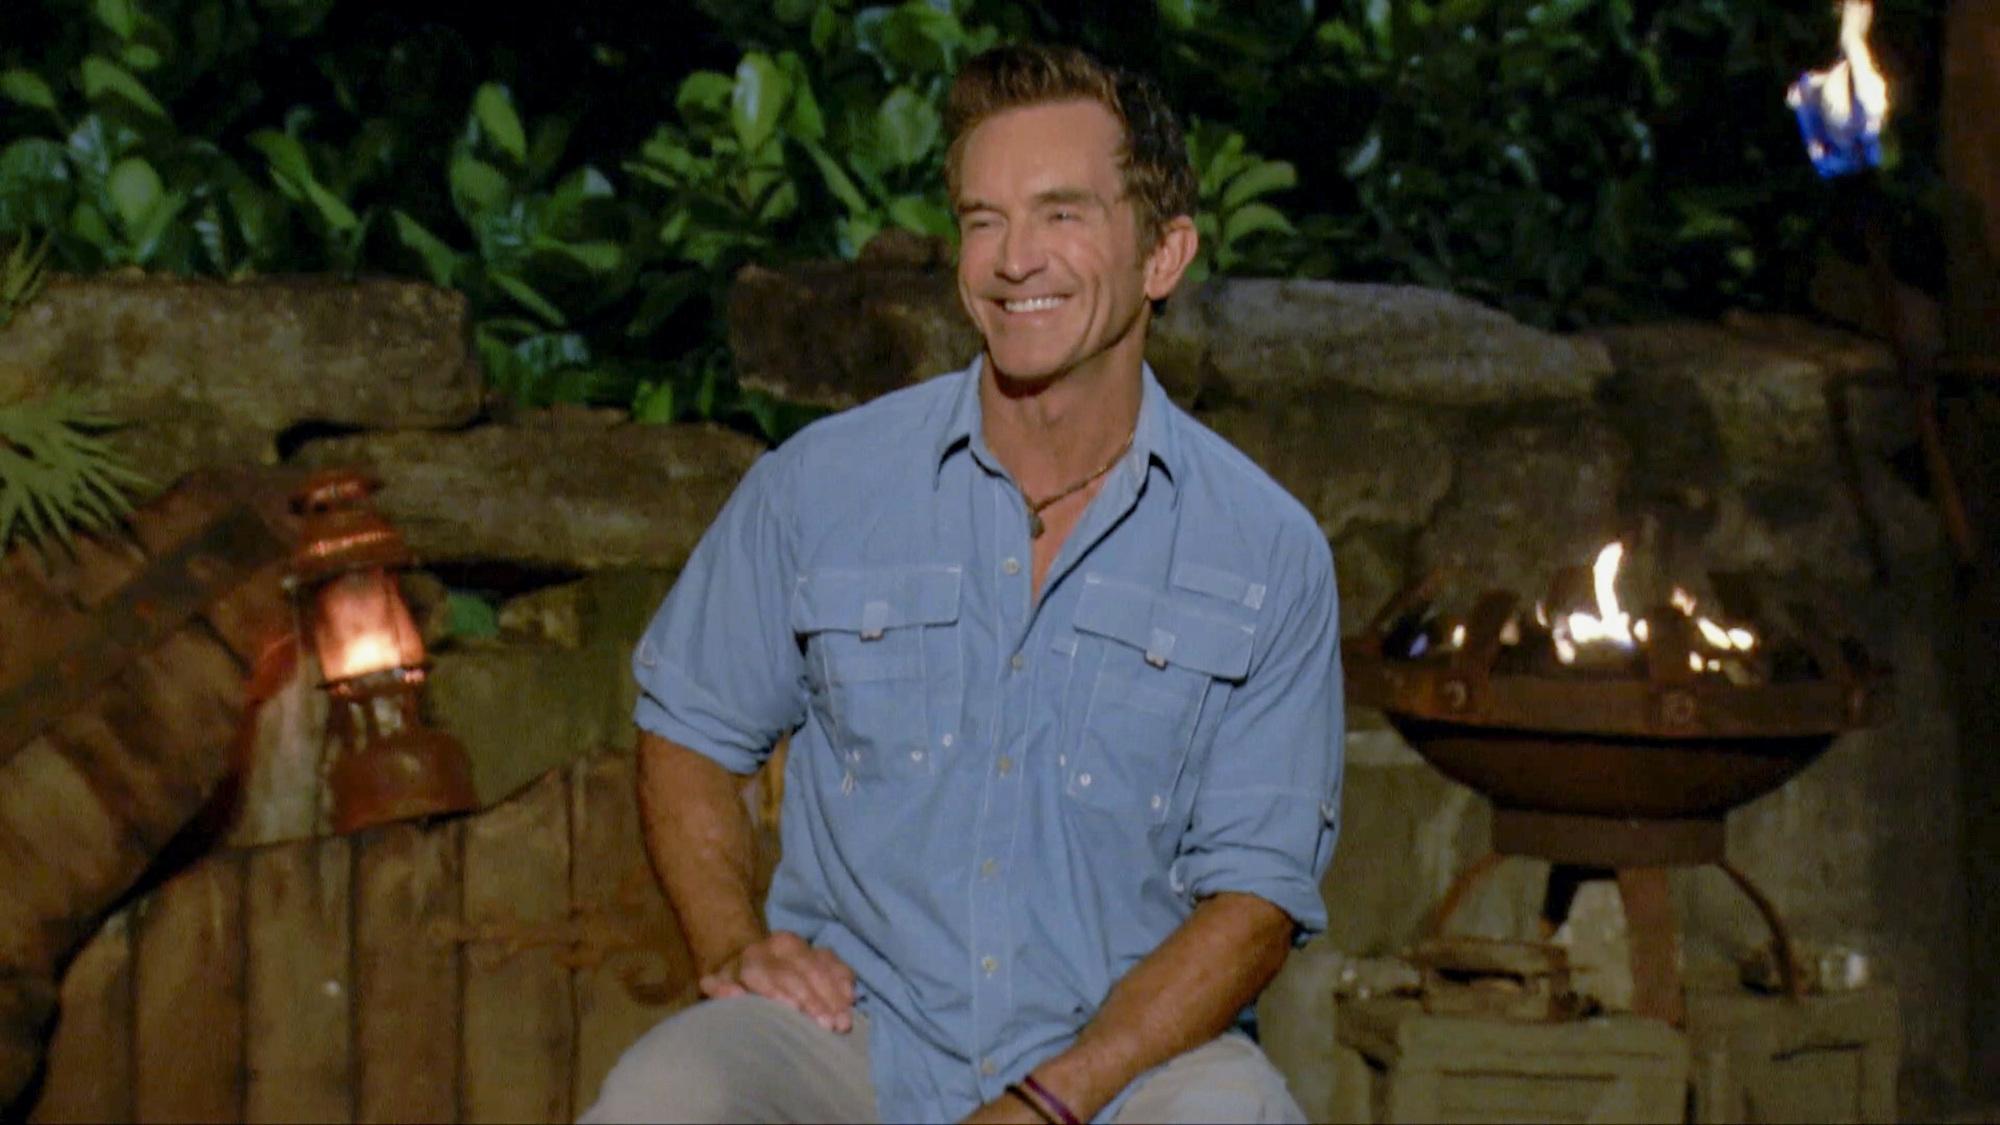 'Survivor' host Jeff Probst